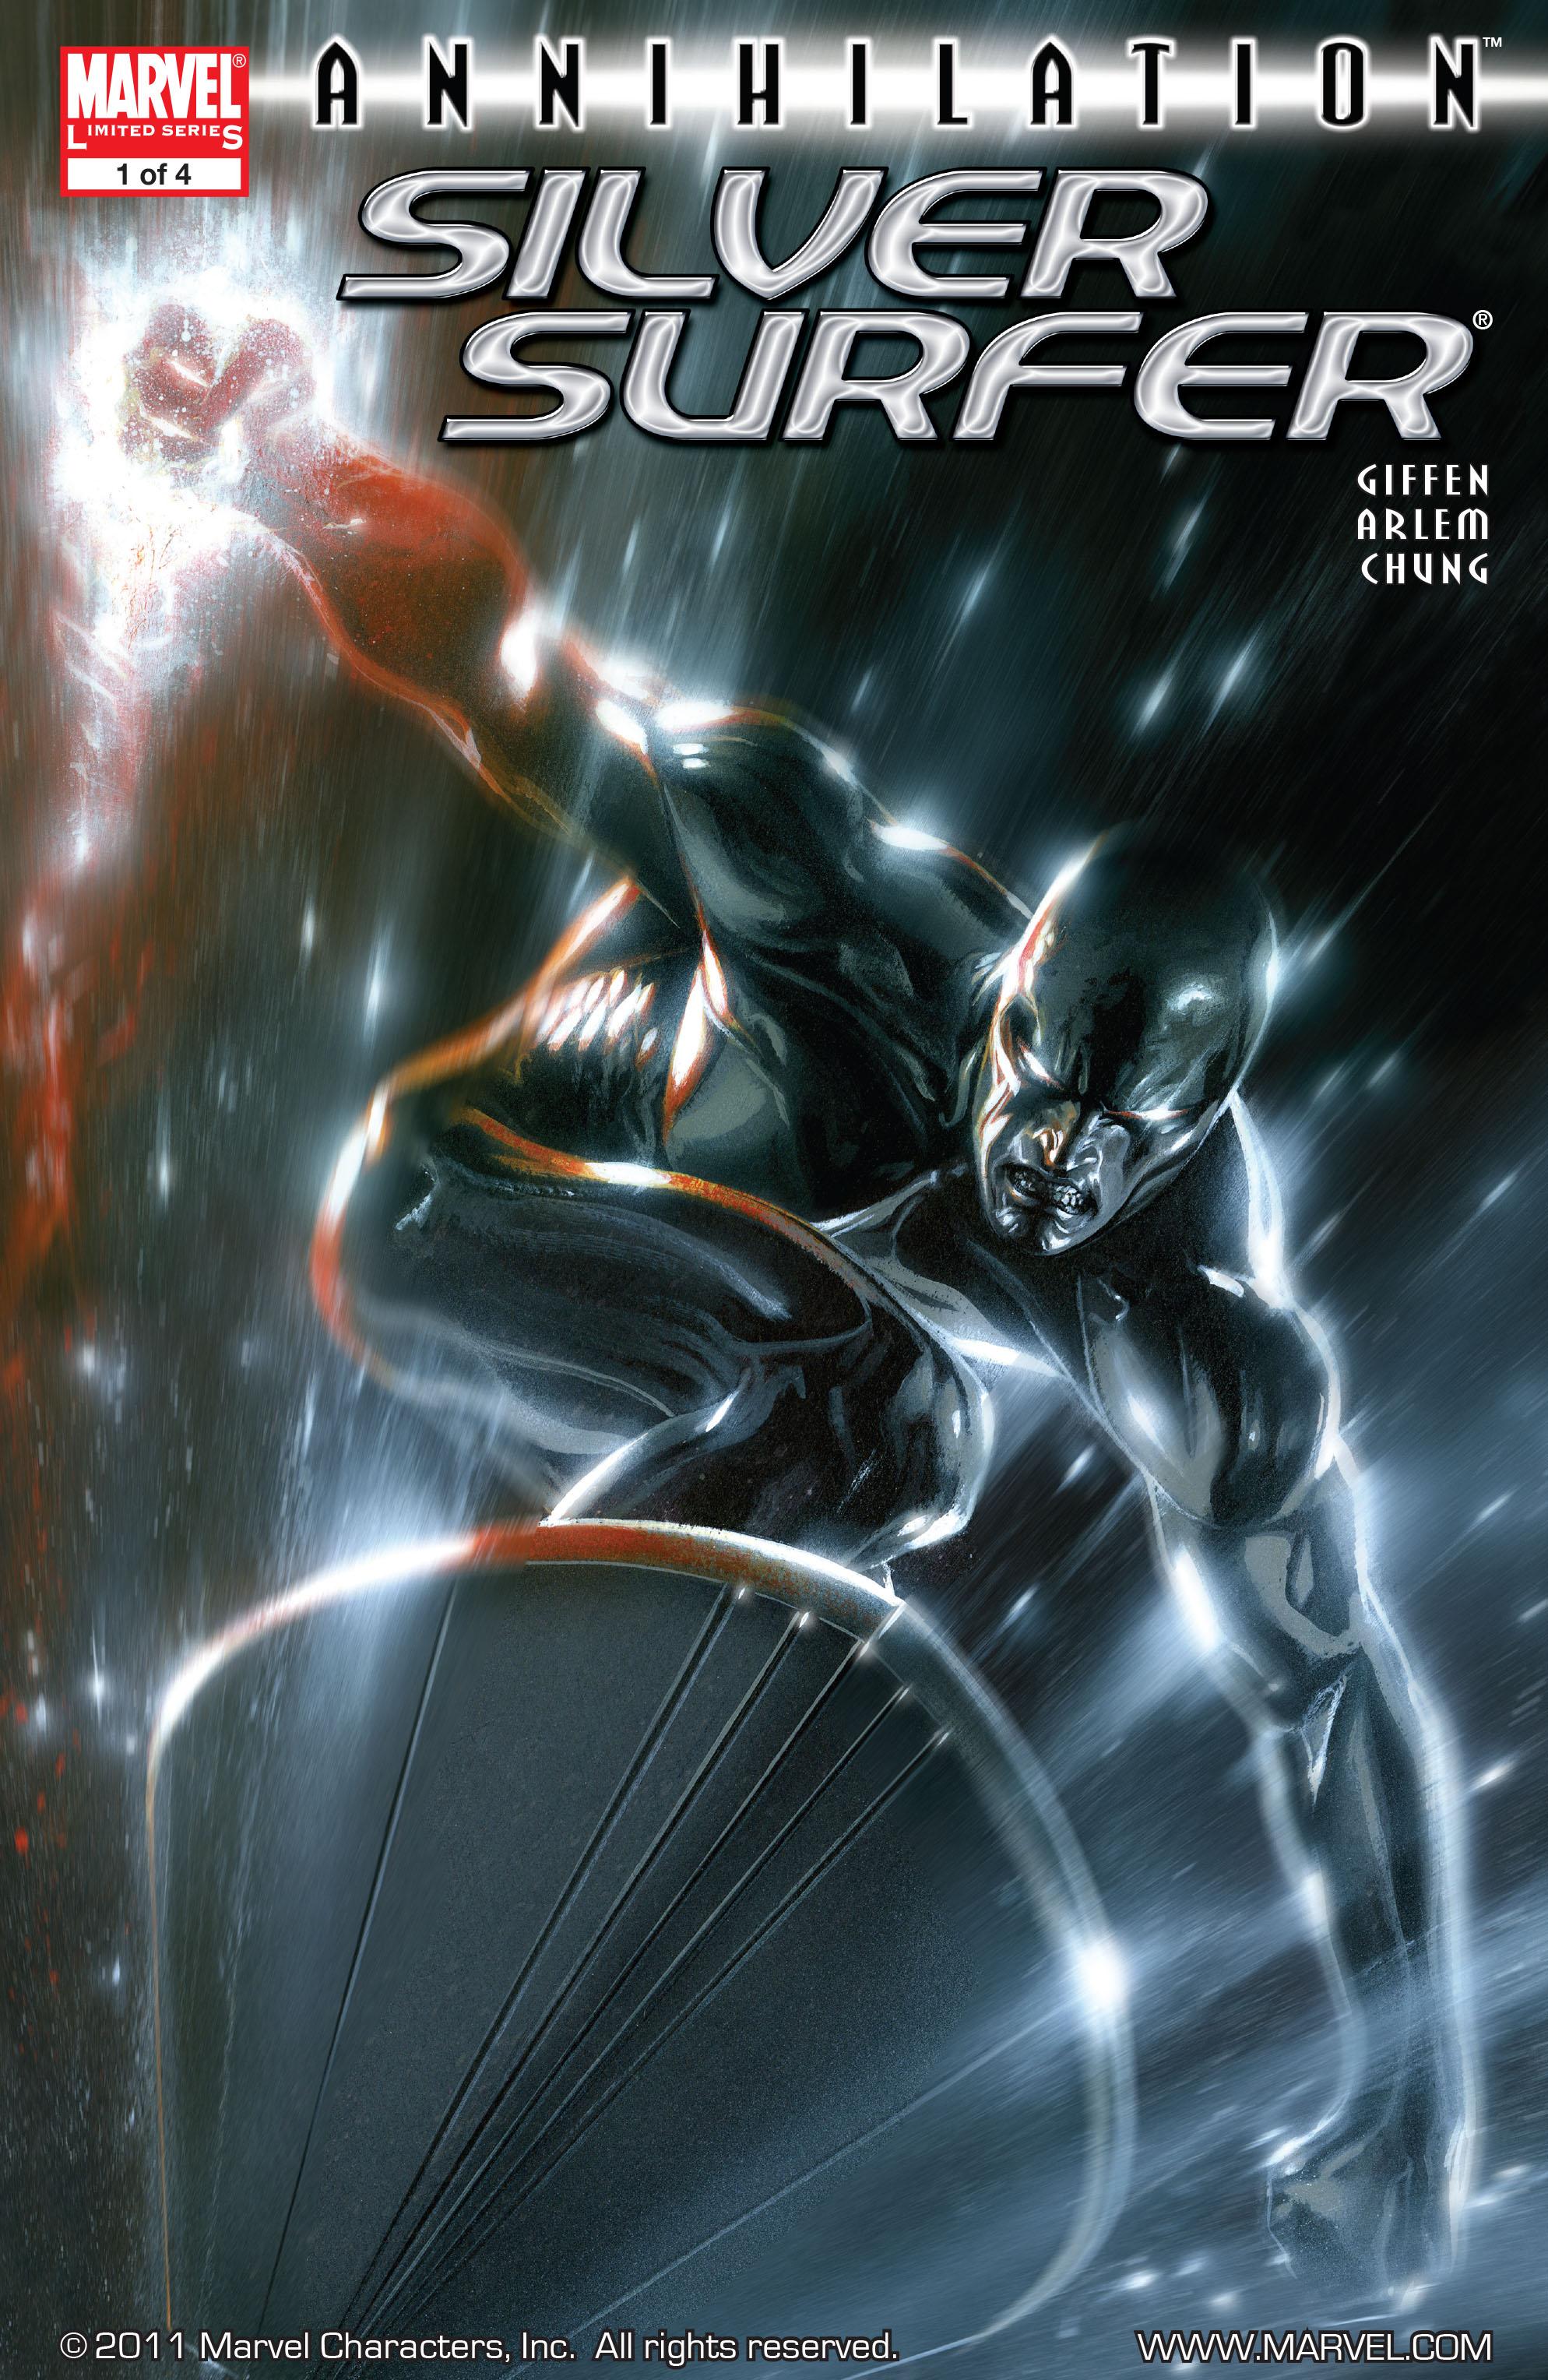 Read online Annihilation: Silver Surfer comic -  Issue #1 - 1